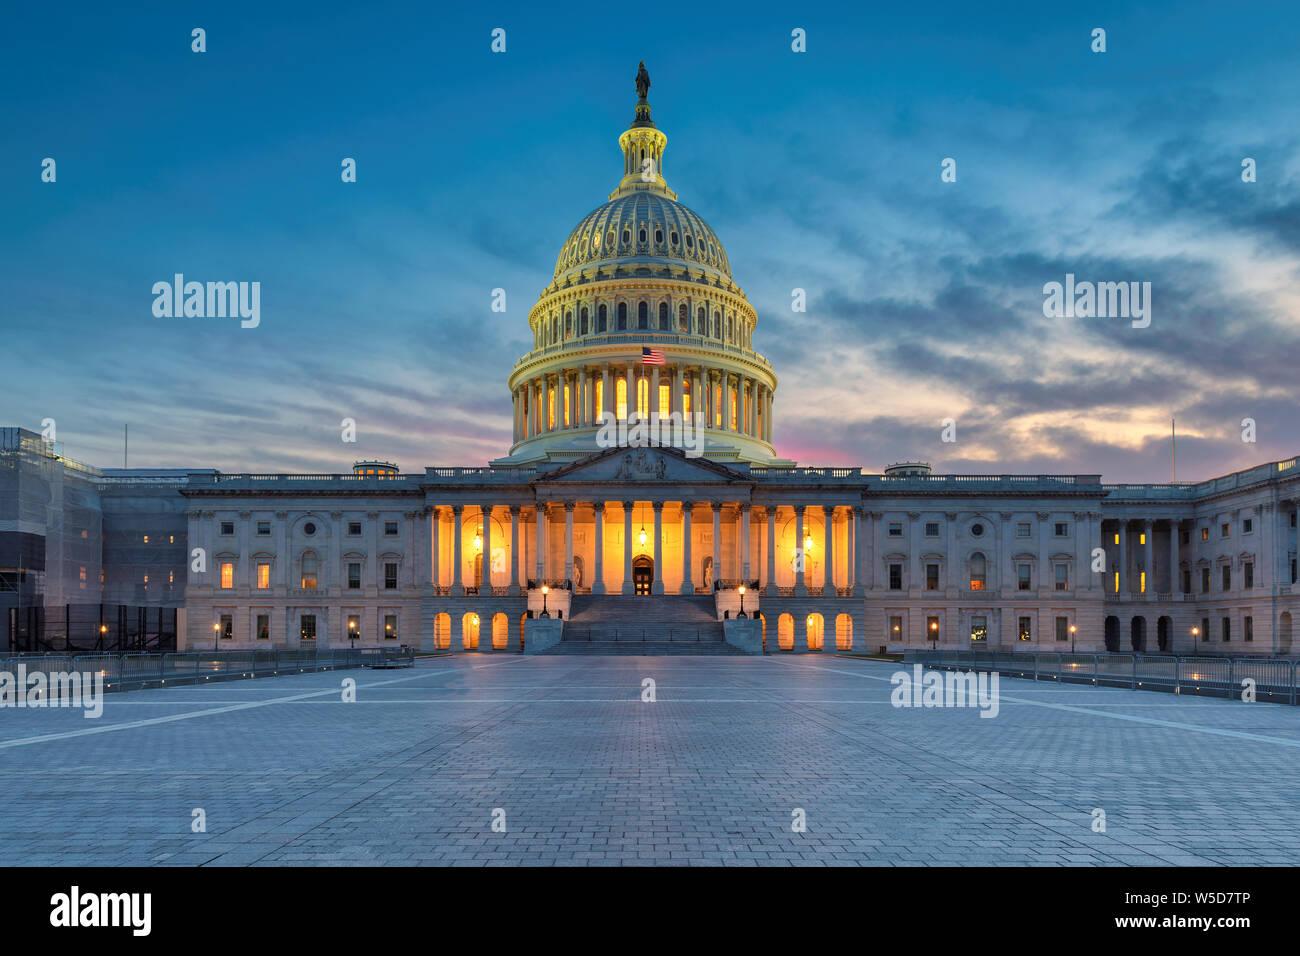 The United States Capitol building at sunset, Washington DC, USA. Stock Photo